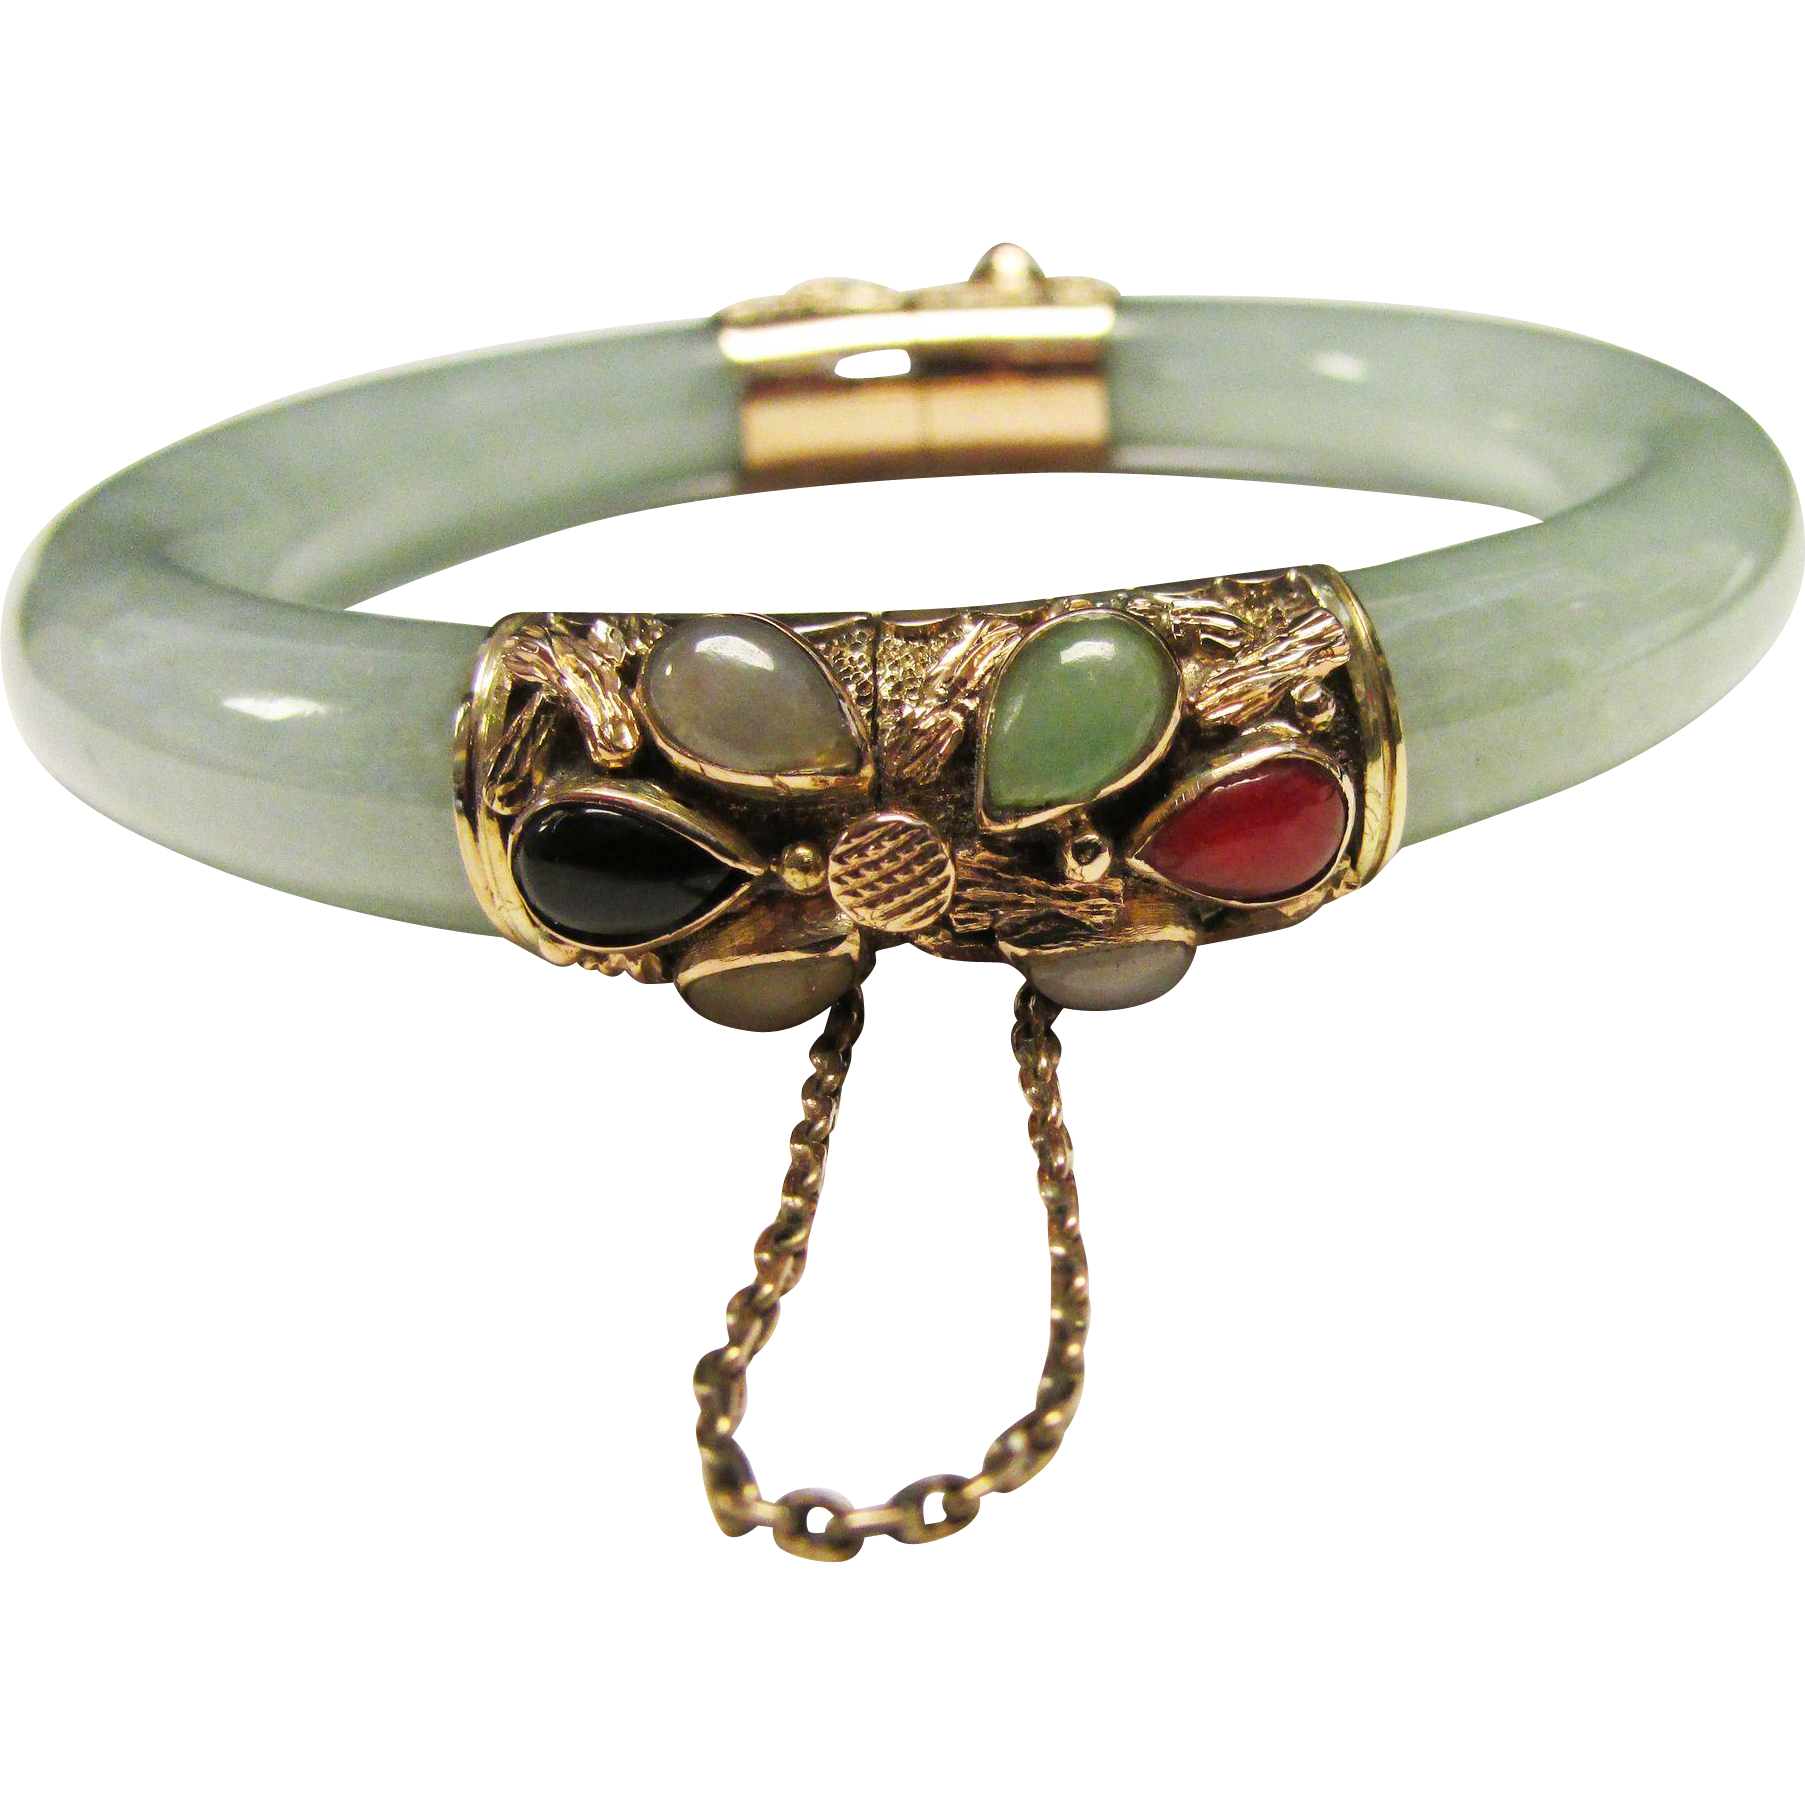 Vintage Estate 14k Ornate Gold Hinged Translucent Green Jade Bracelet Aloha Memorabilia Jewelry Ruby Lane